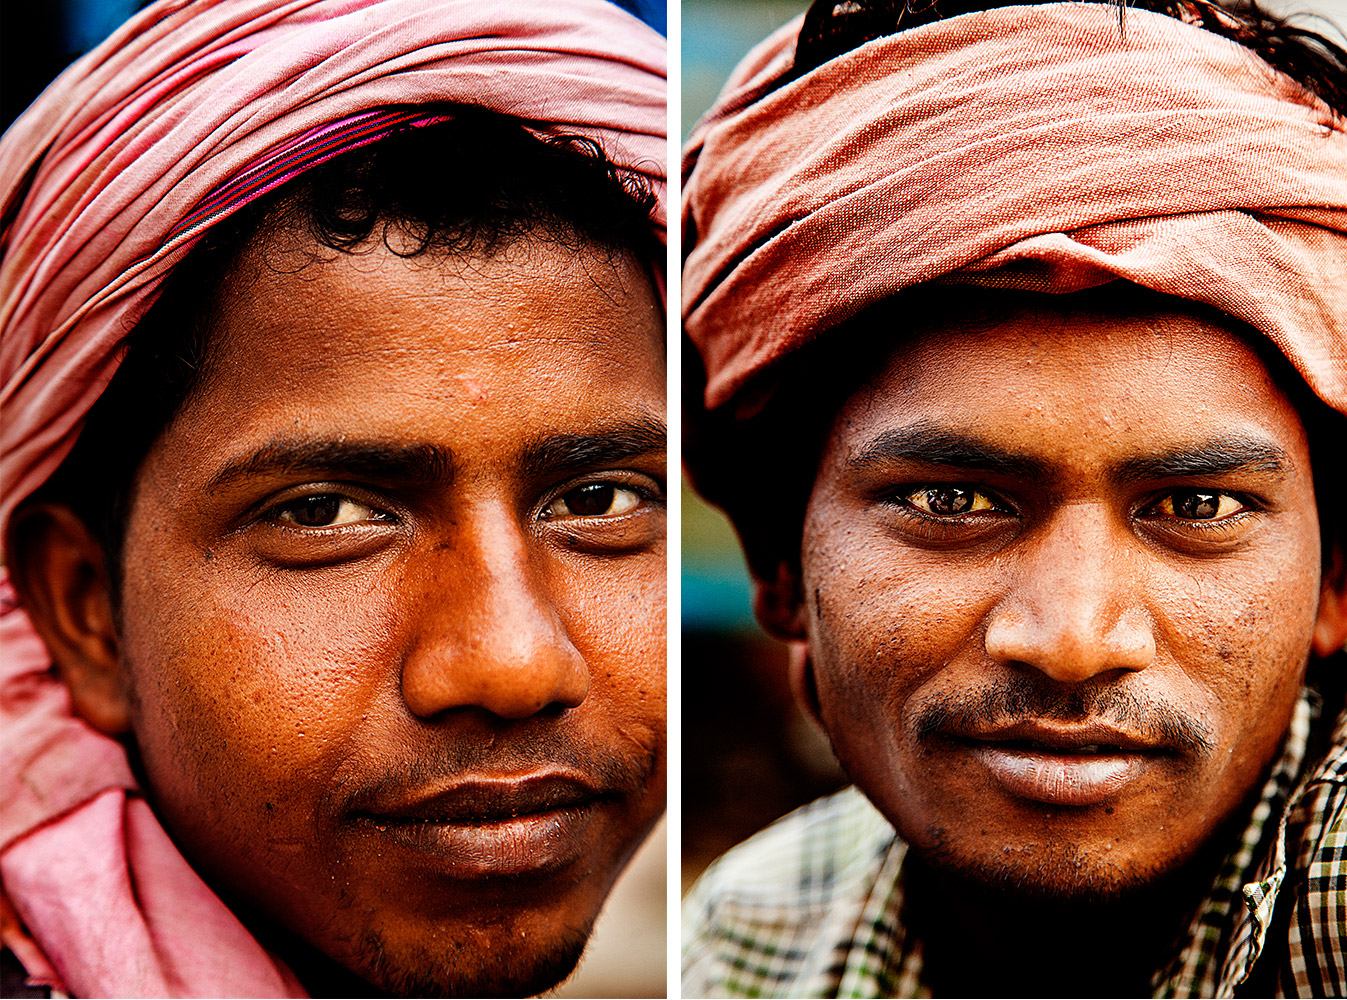 India-Portraits-DUO-009.jpg